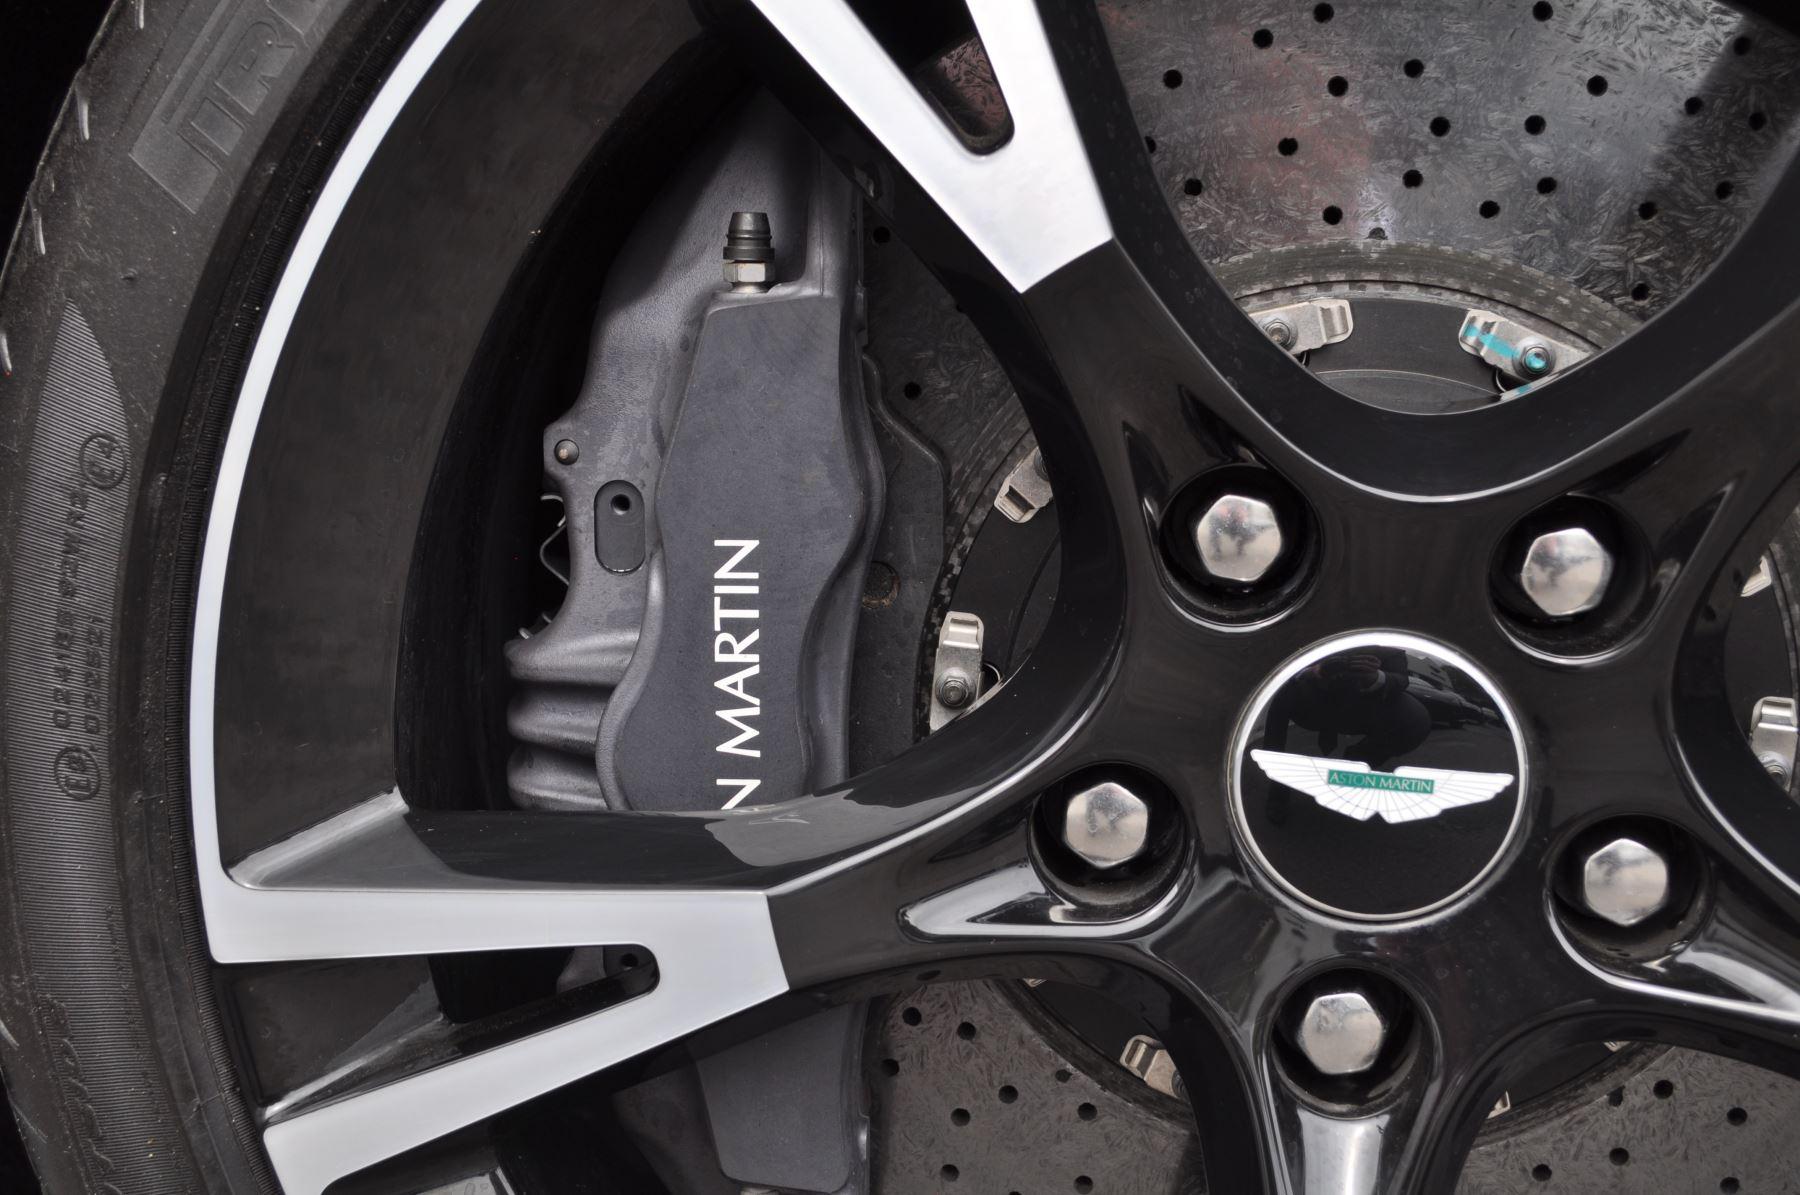 Aston Martin Vanquish S V12 [595] S 2+2 2dr Touchtronic image 48